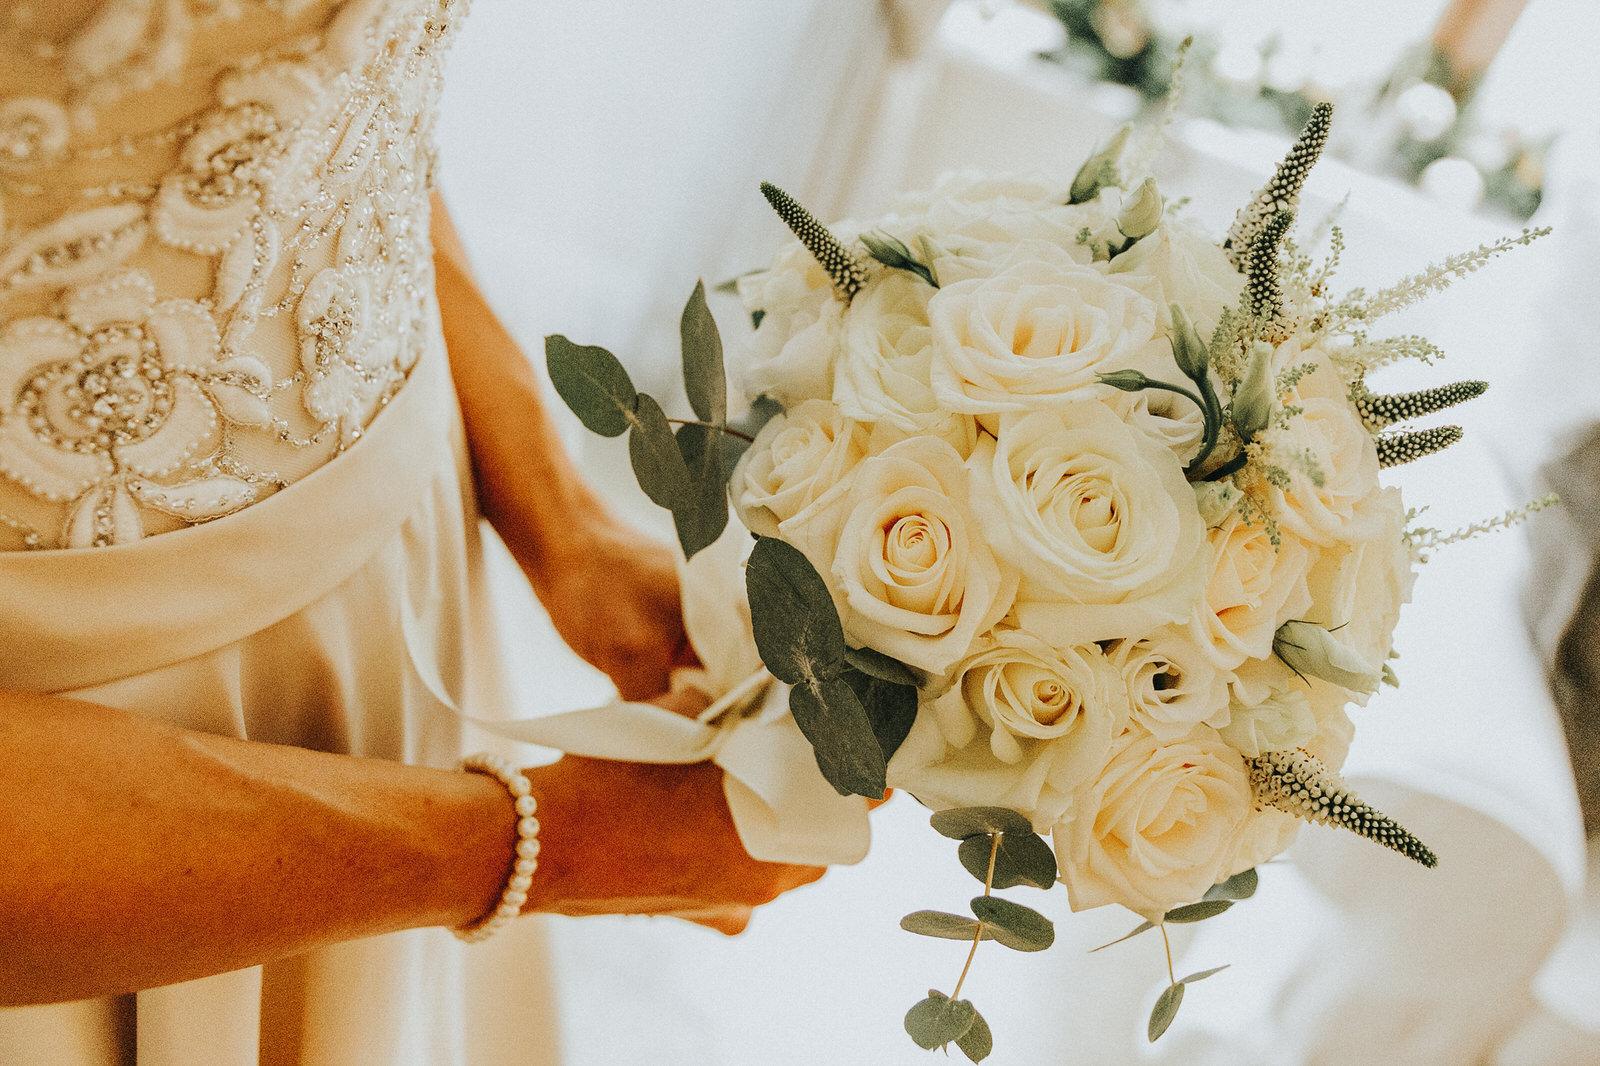 Roger_Kenny_wedding_photographer_418.jpg